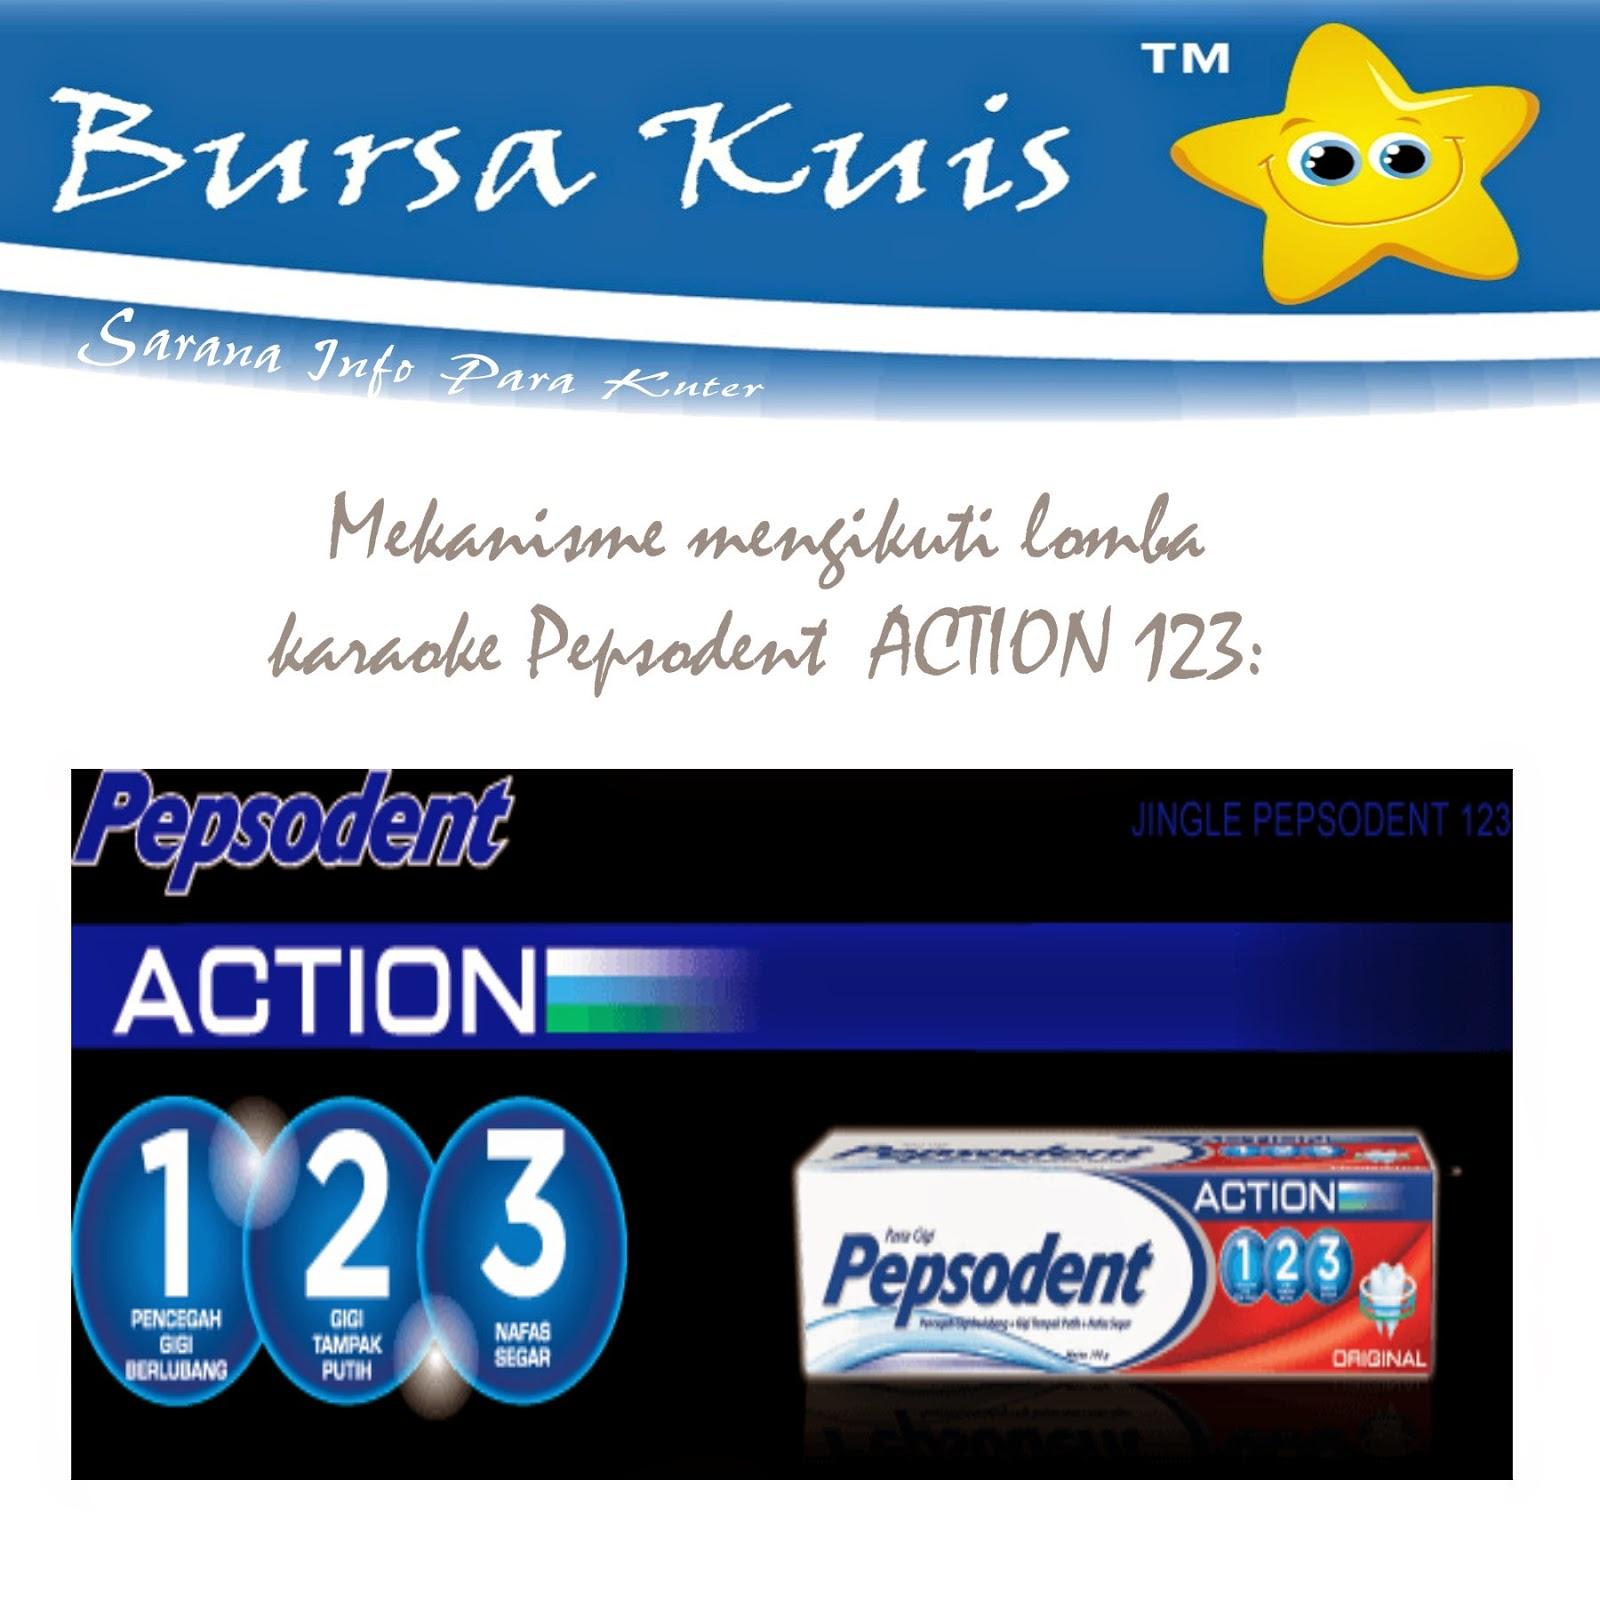 Lirik Lagu Pepsodent Action 123 : lirik, pepsodent, action, Mekanisme, Mengikuti, Lomba, Karaoke, Pepsodent, ACTION, Situs, Informasi